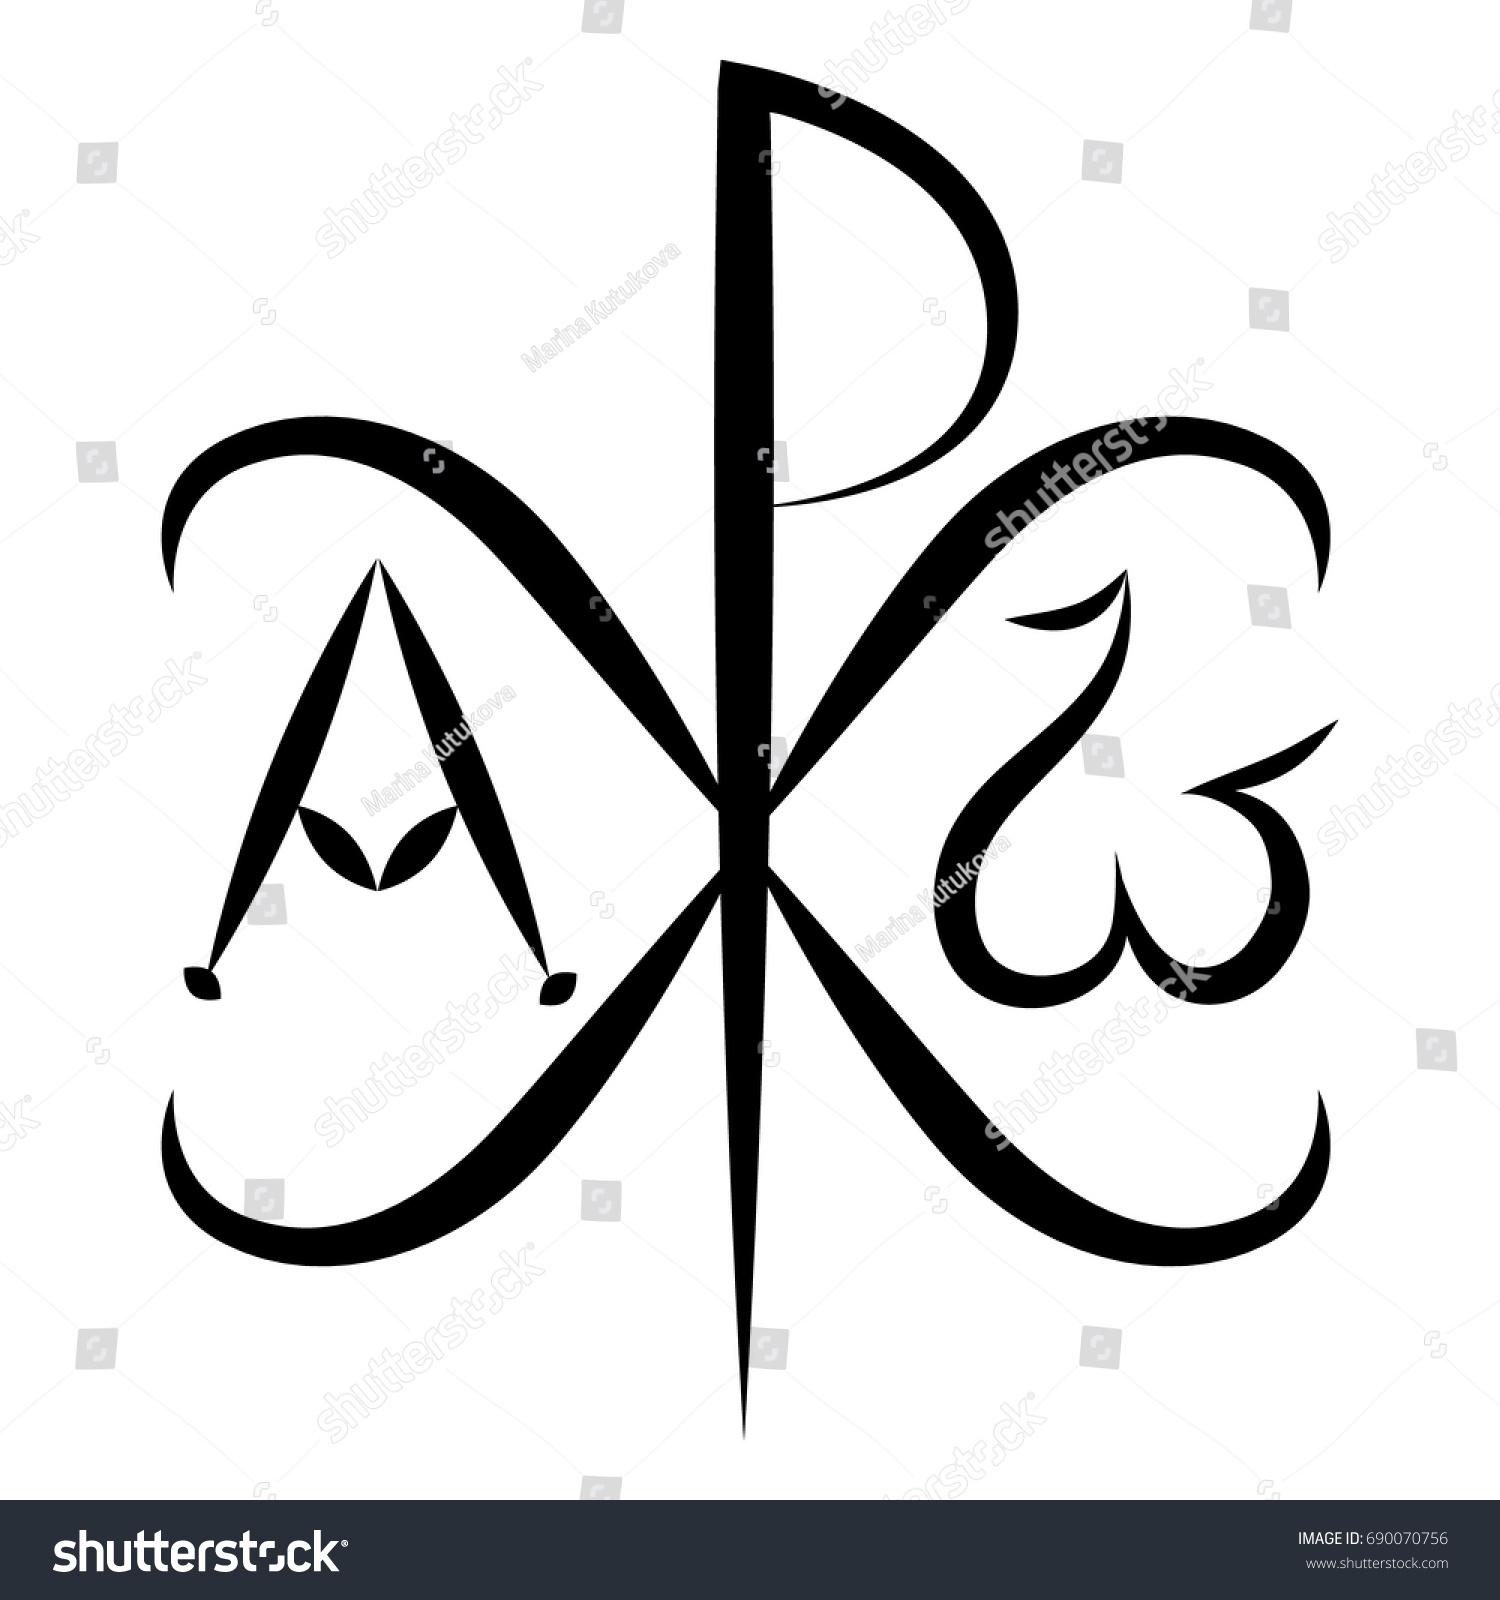 Chi ro chrisma chrismon monogram name stock vector 690070756 monogram of the name of christ i am biocorpaavc